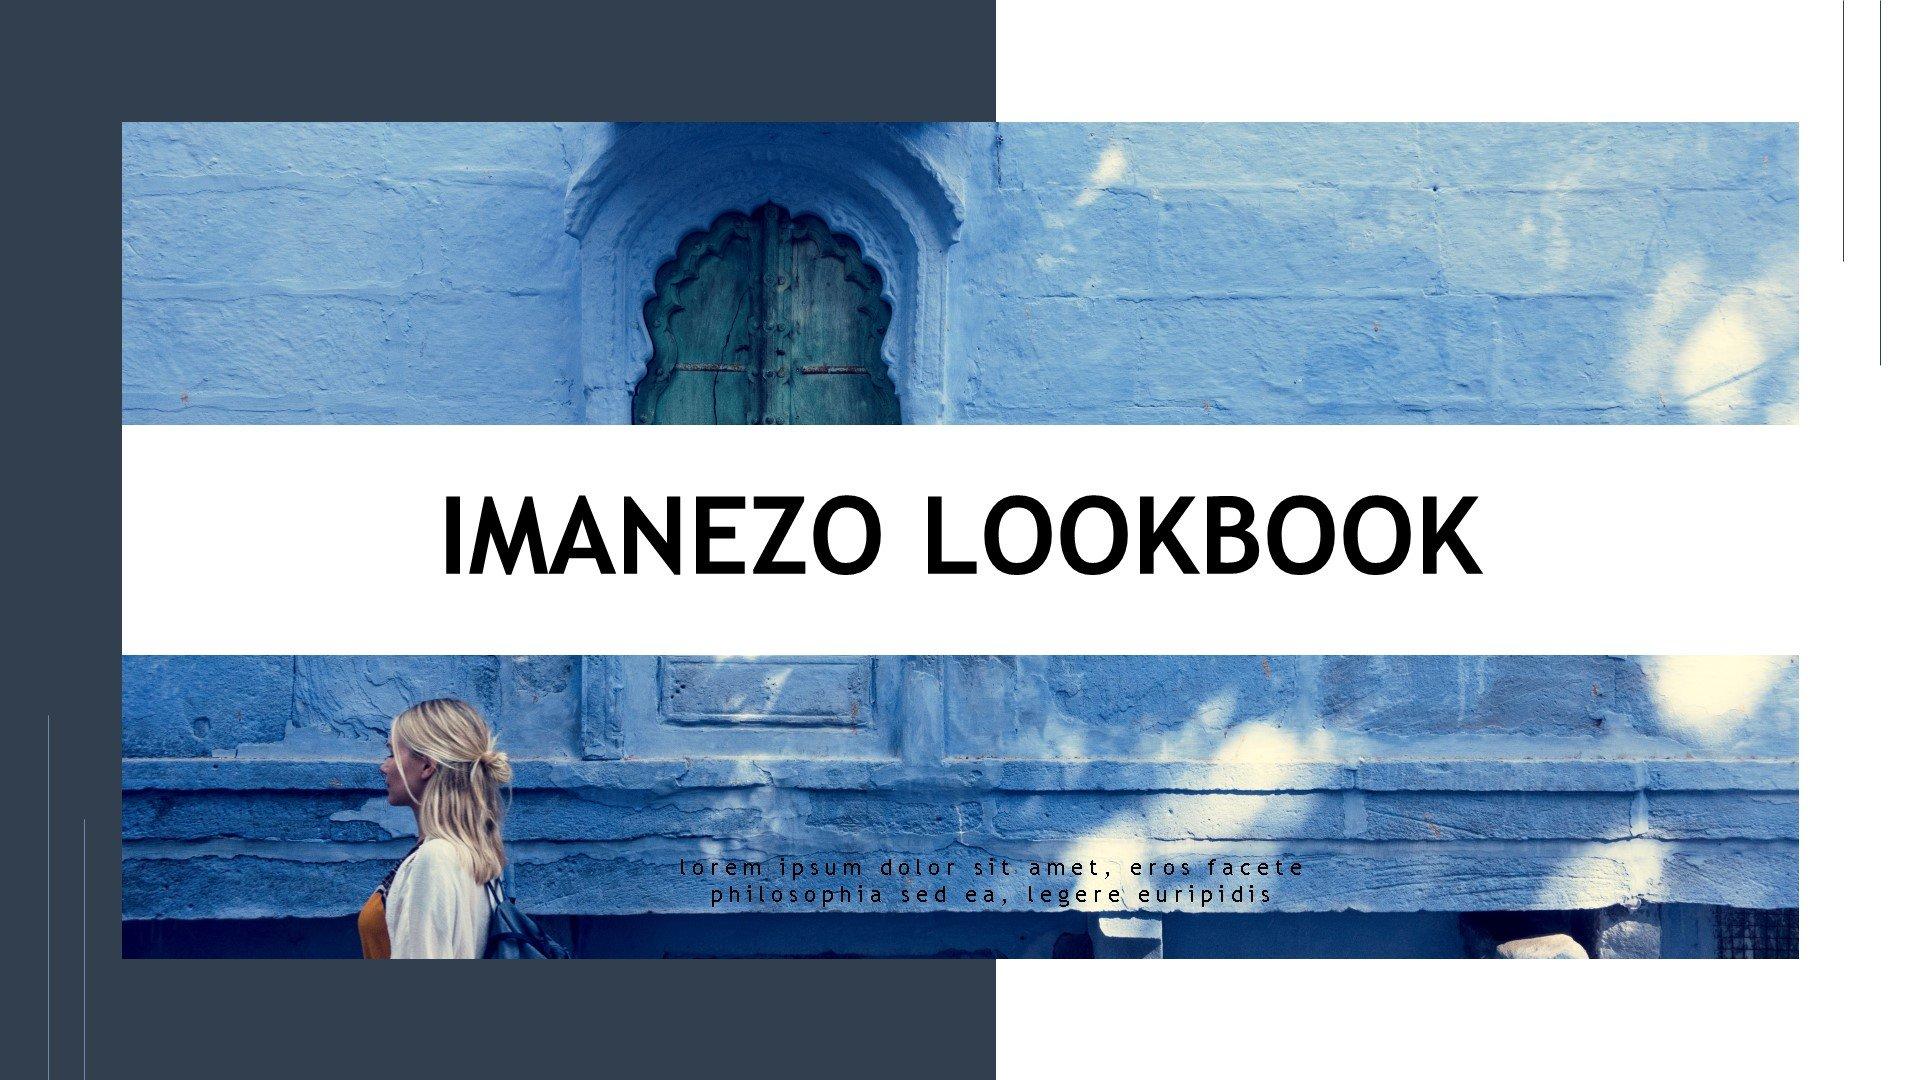 Imanezo - Lookbook Presentaion Template PowerPoint №83911